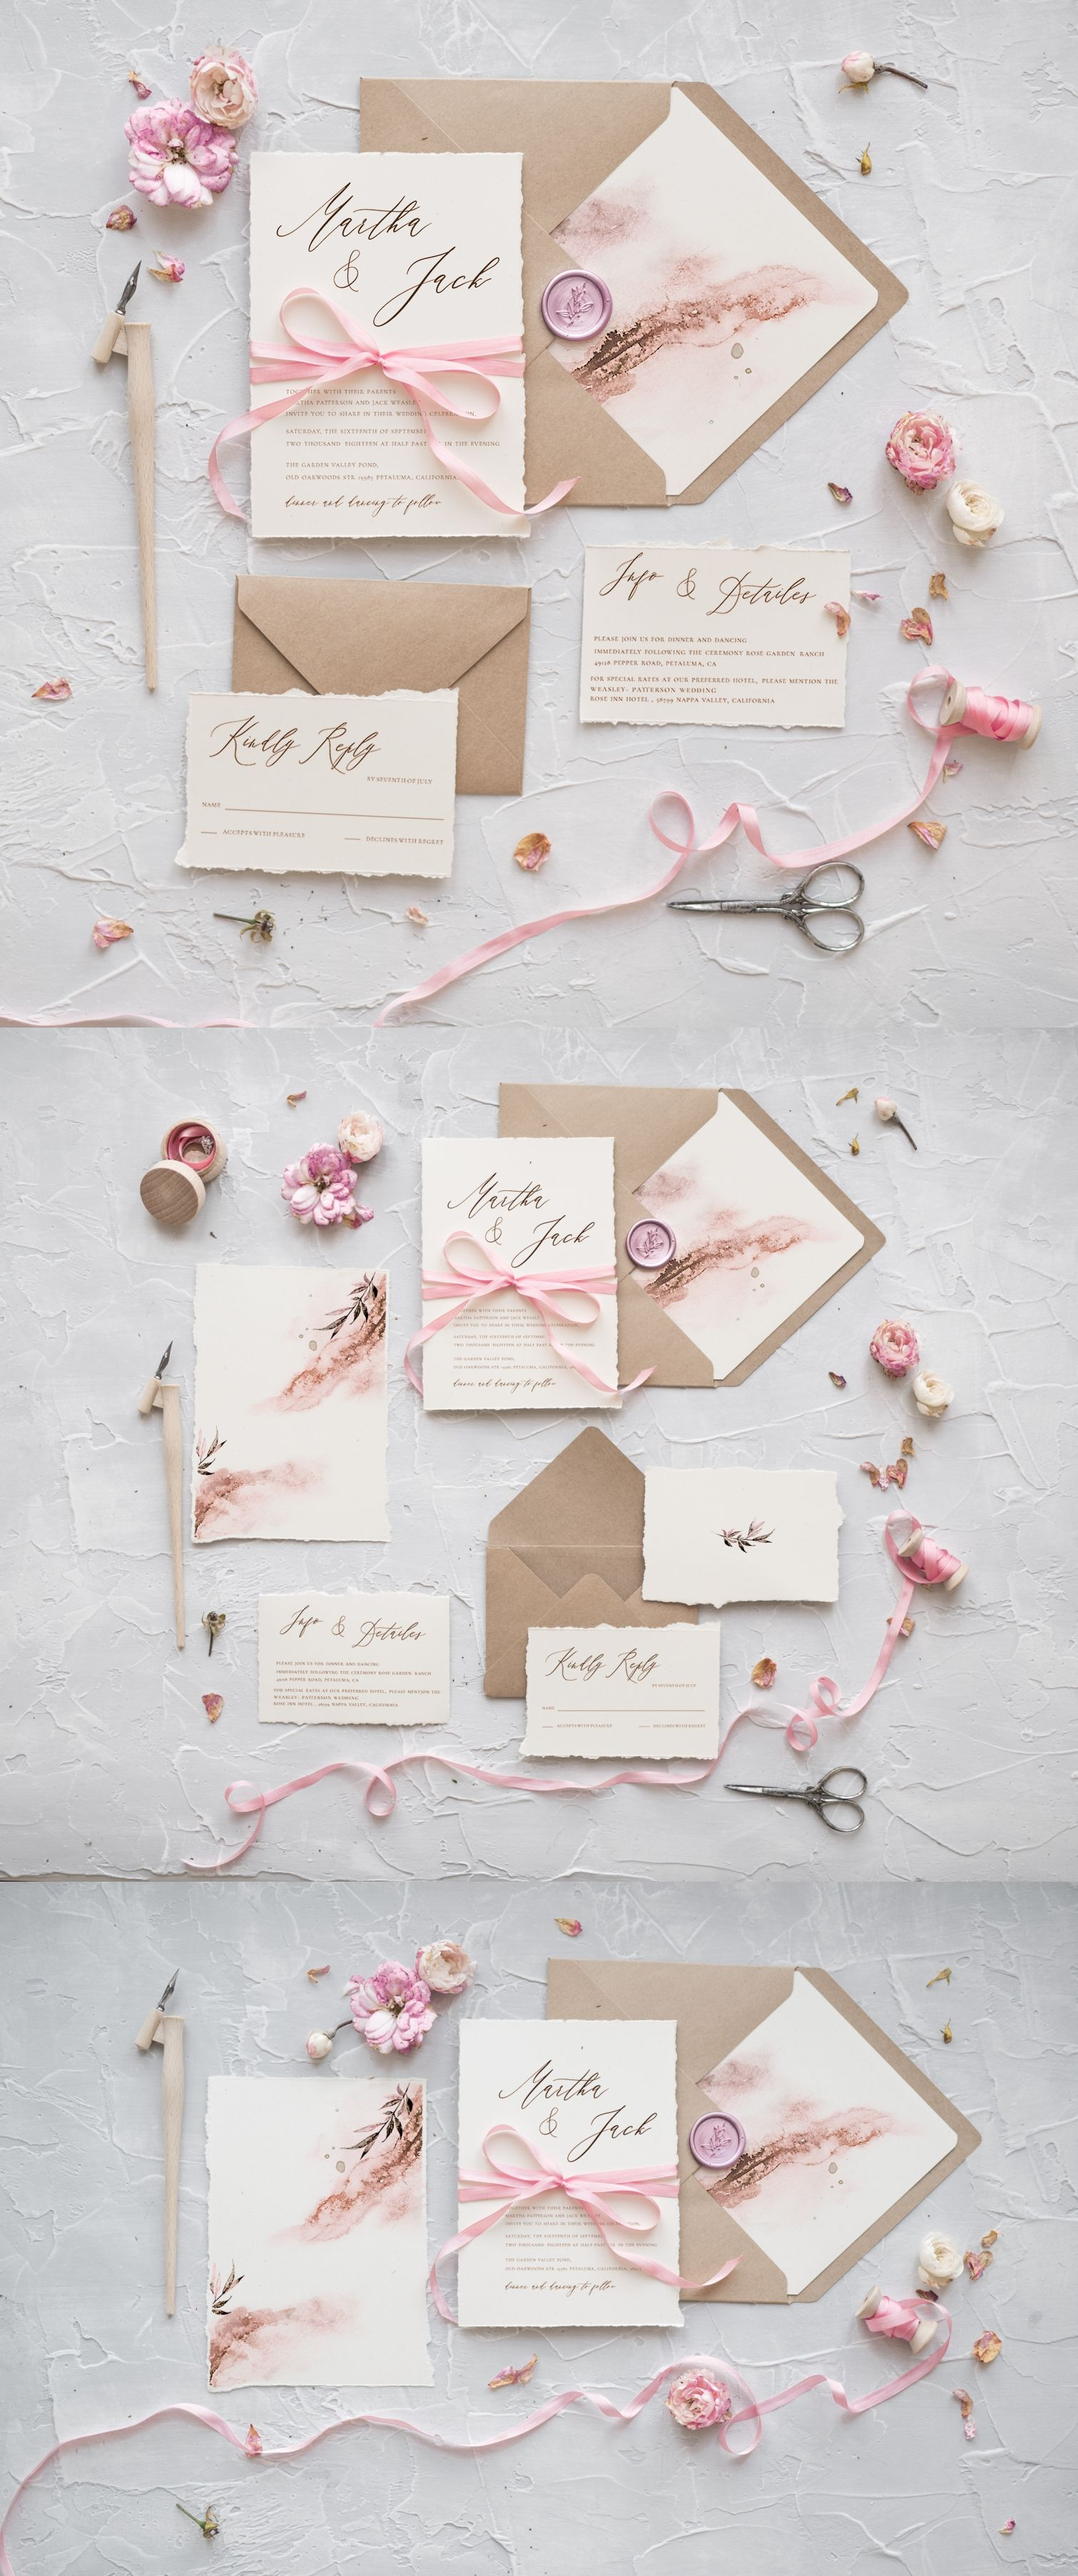 WEDDING INVITATIONS calligraphy | Pink wedding invitations, Weddings ...